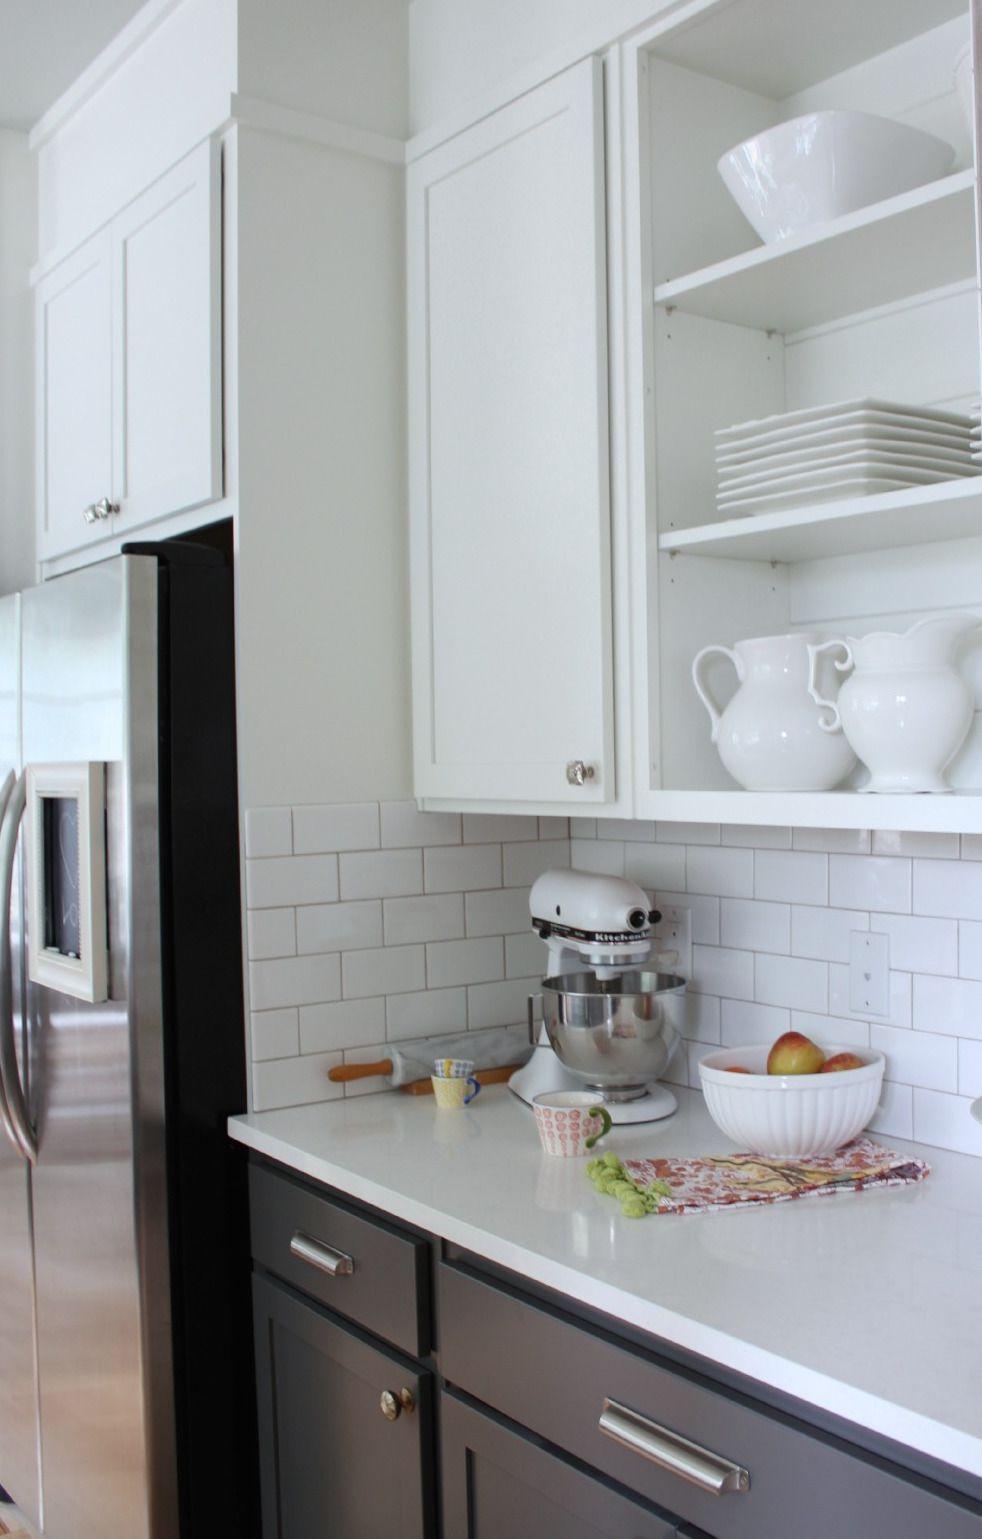 Home Decor Trends 2016 The Mismatched Kitchen Kitchen Cabinet Colors Grey Kitchen Designs Kitchen Design